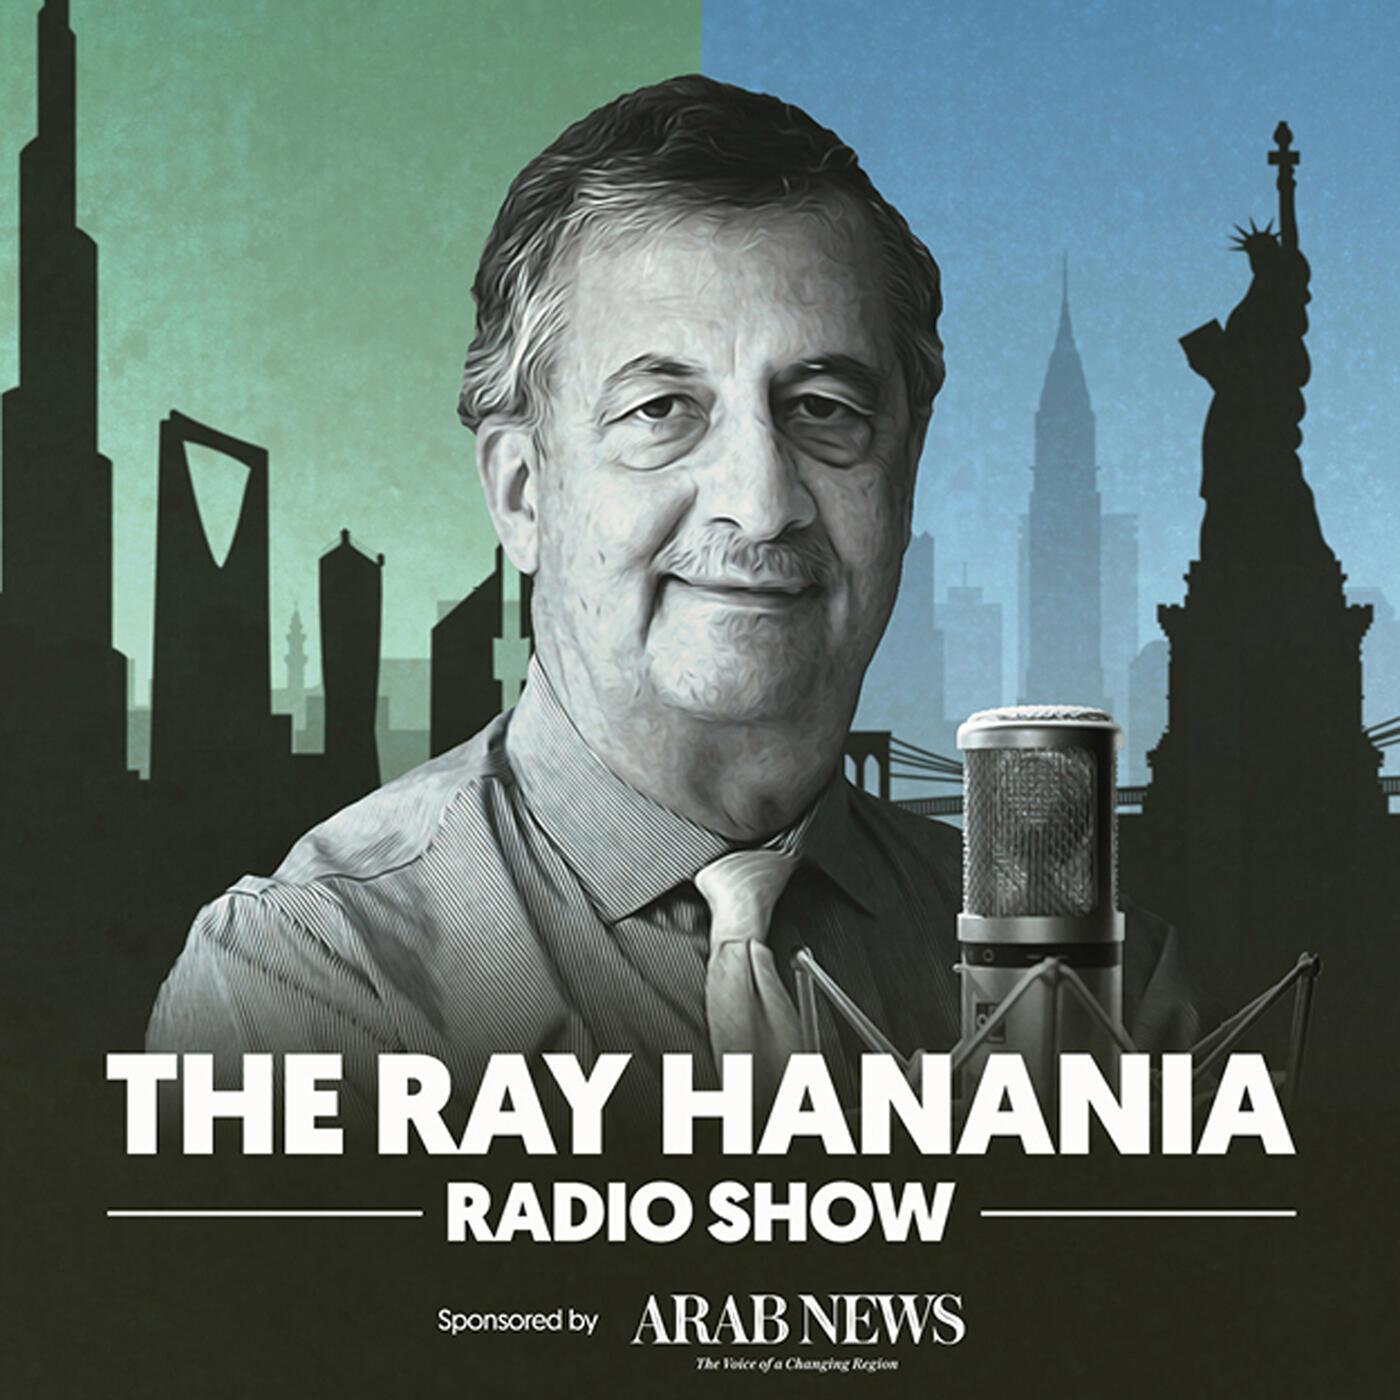 The Ray Hanania Radio Show-Arab News